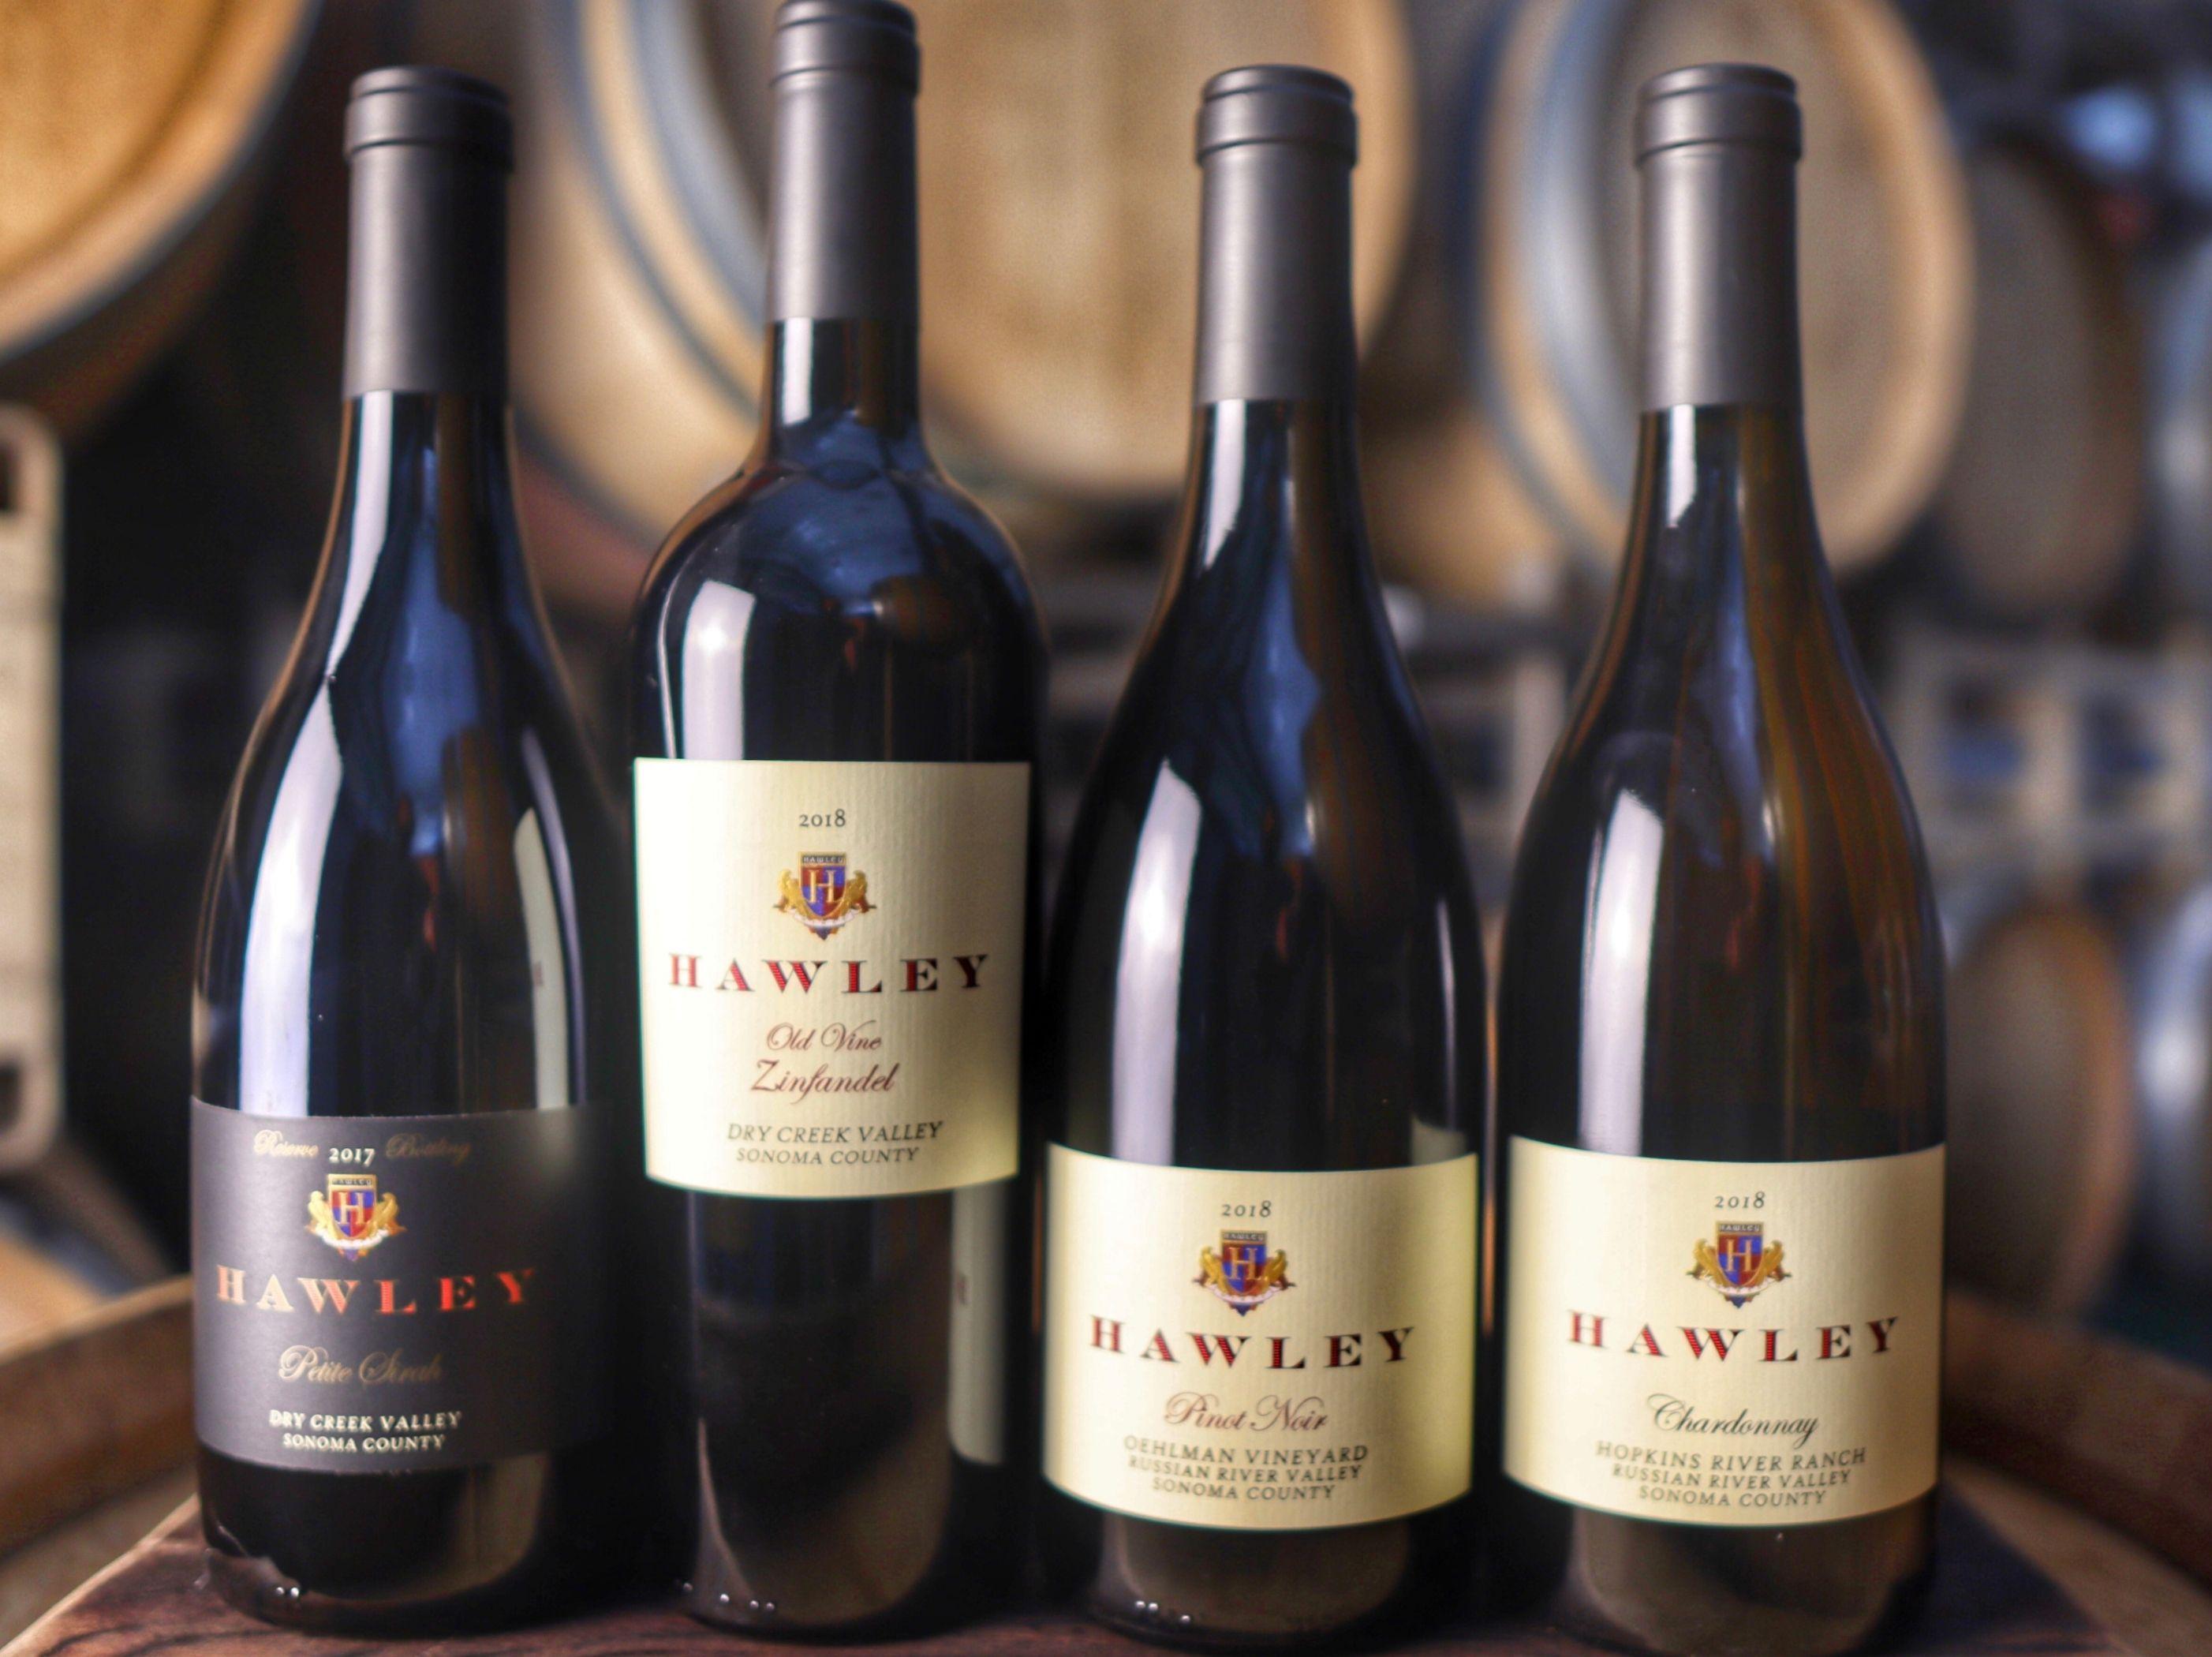 Hawley Current release wine bottles